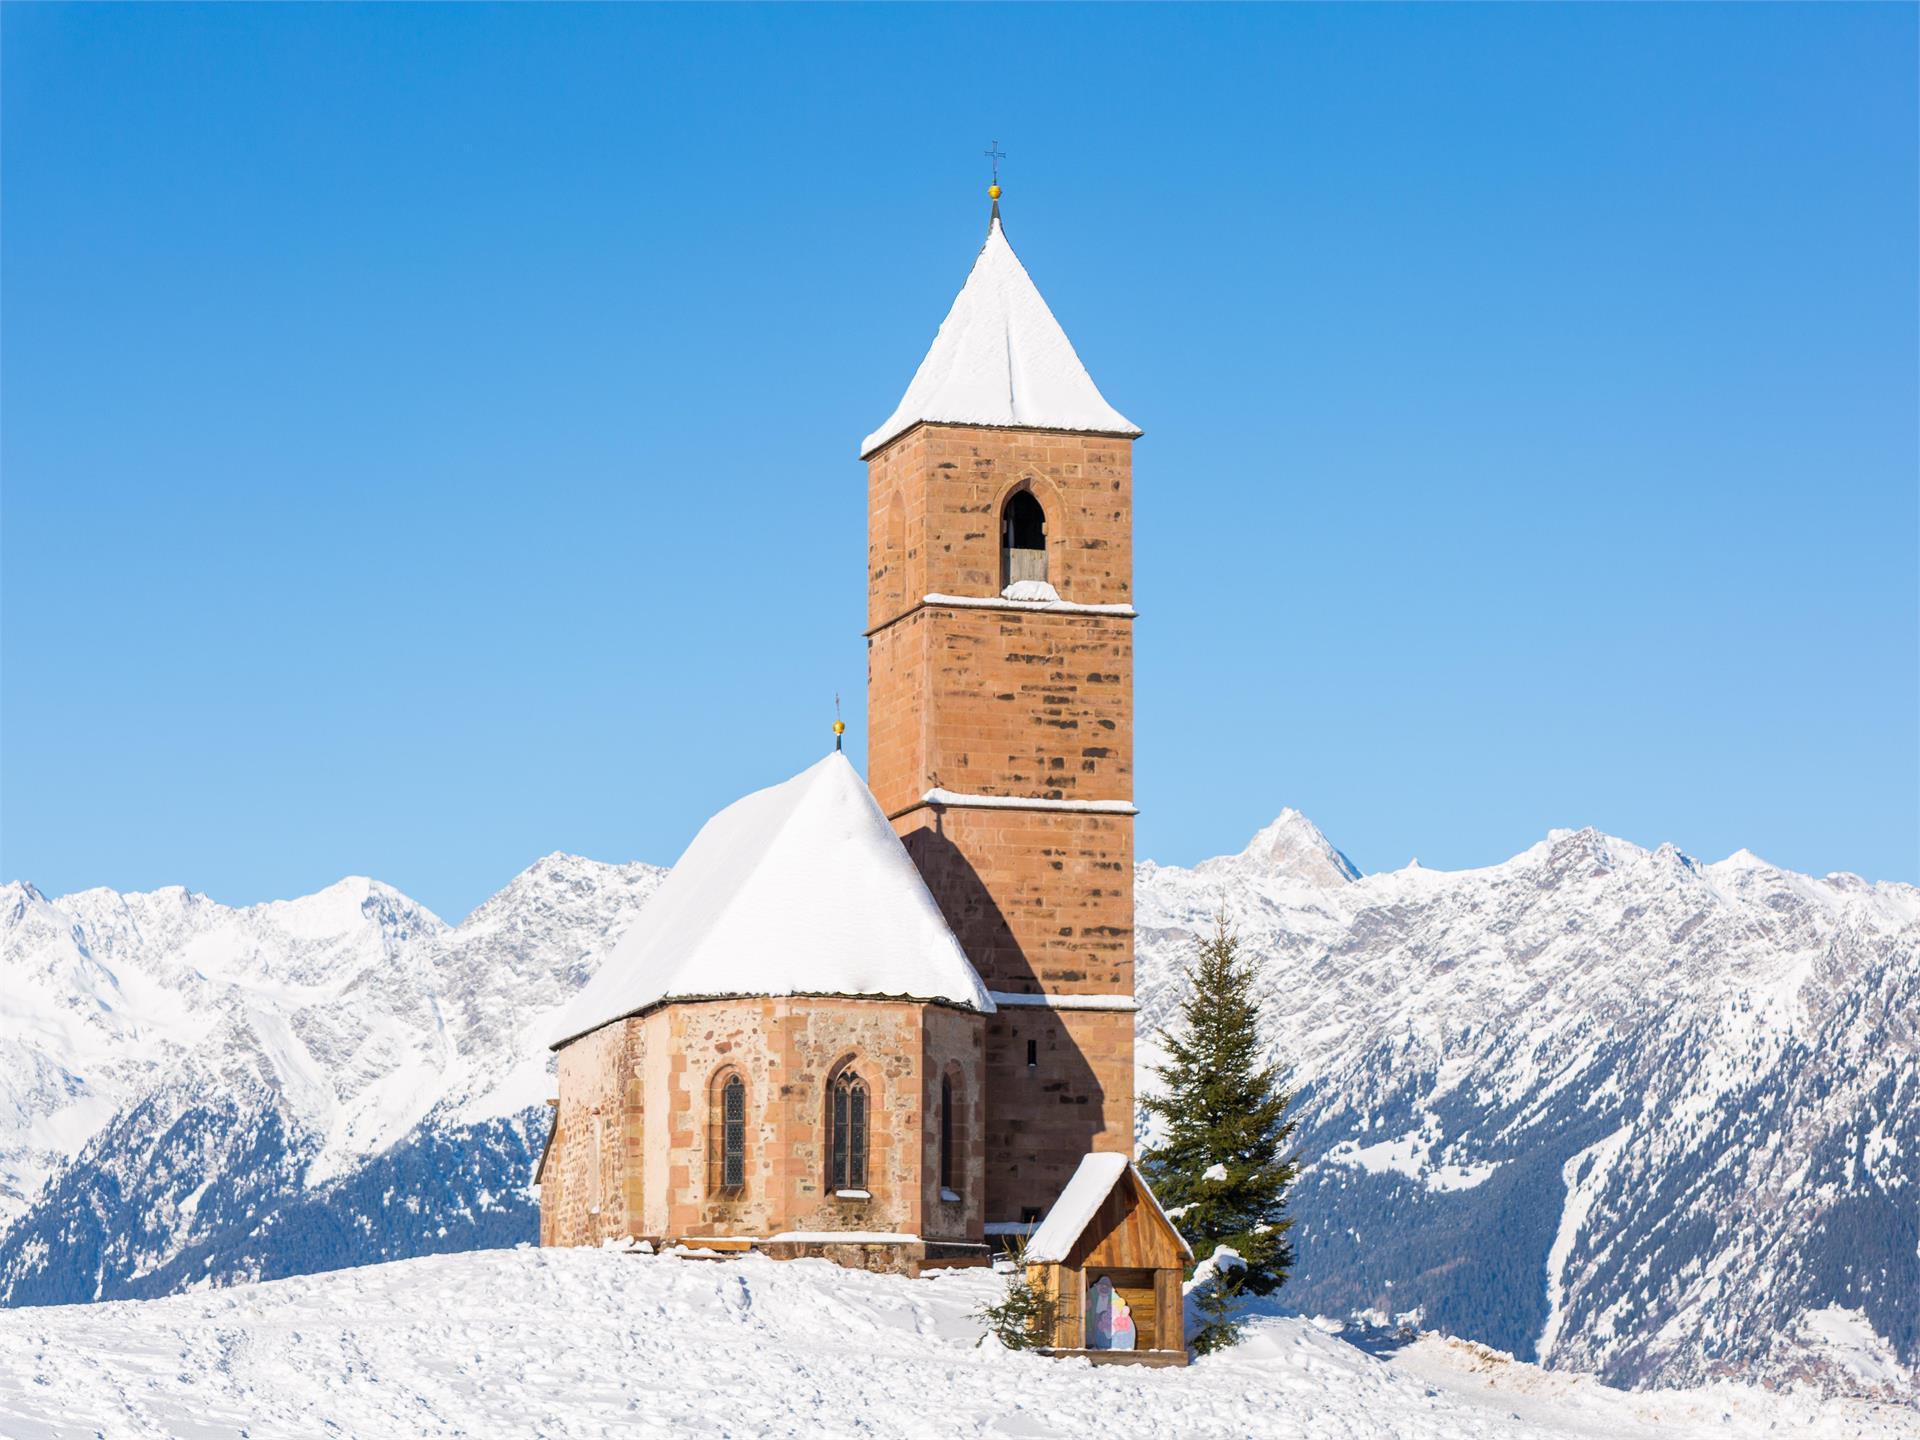 St. Kathrein Kirchlein church